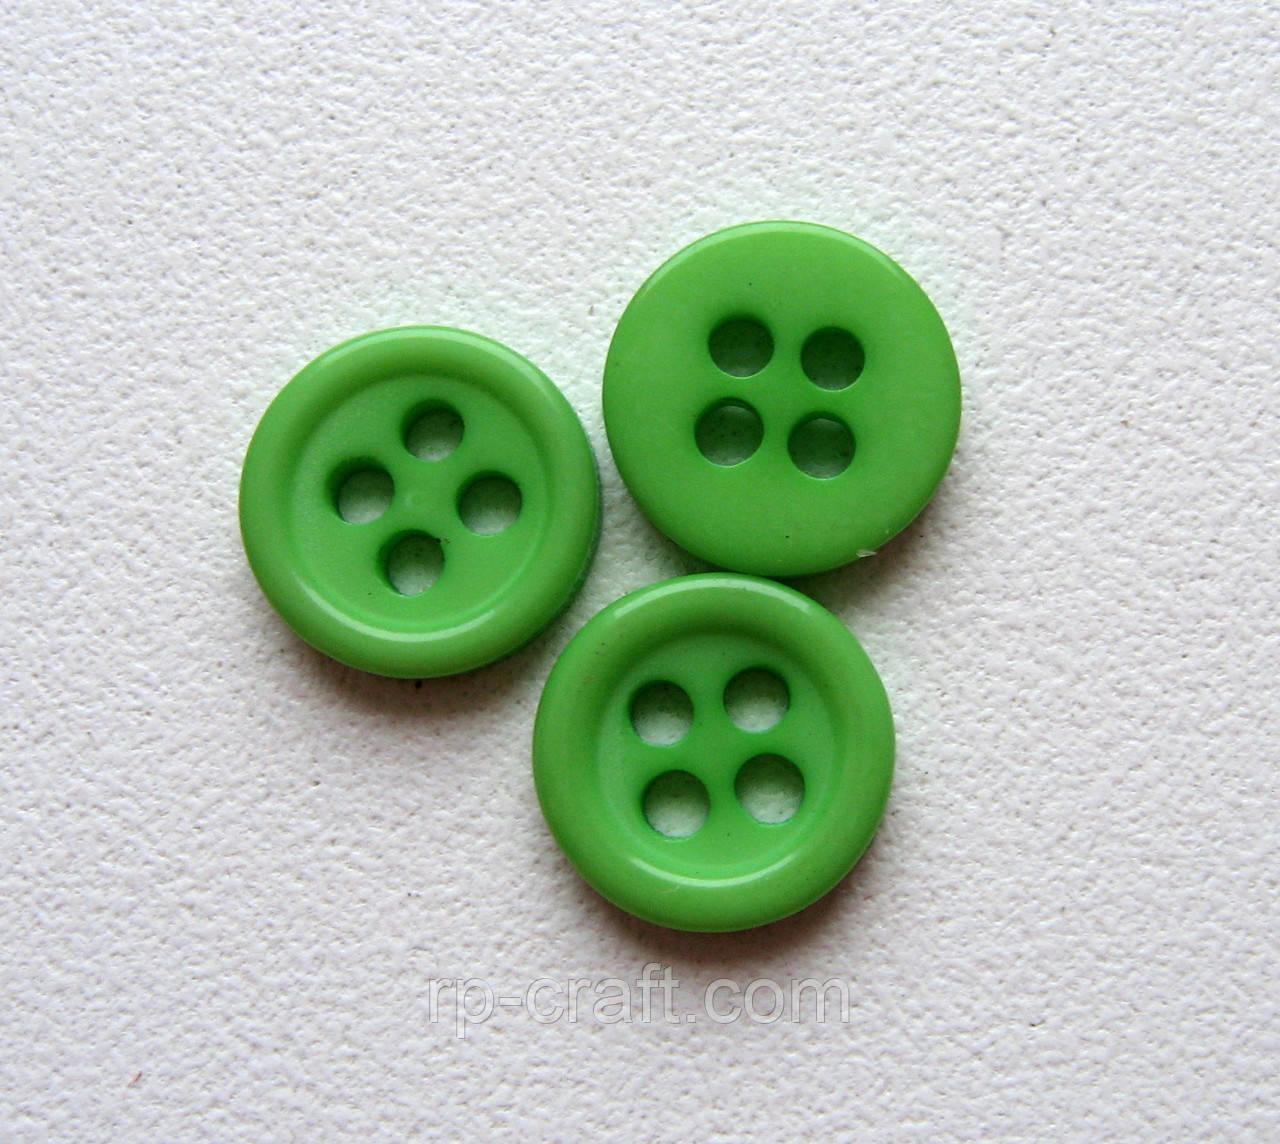 Пуговица пластиковая, зеленая, 9 мм.